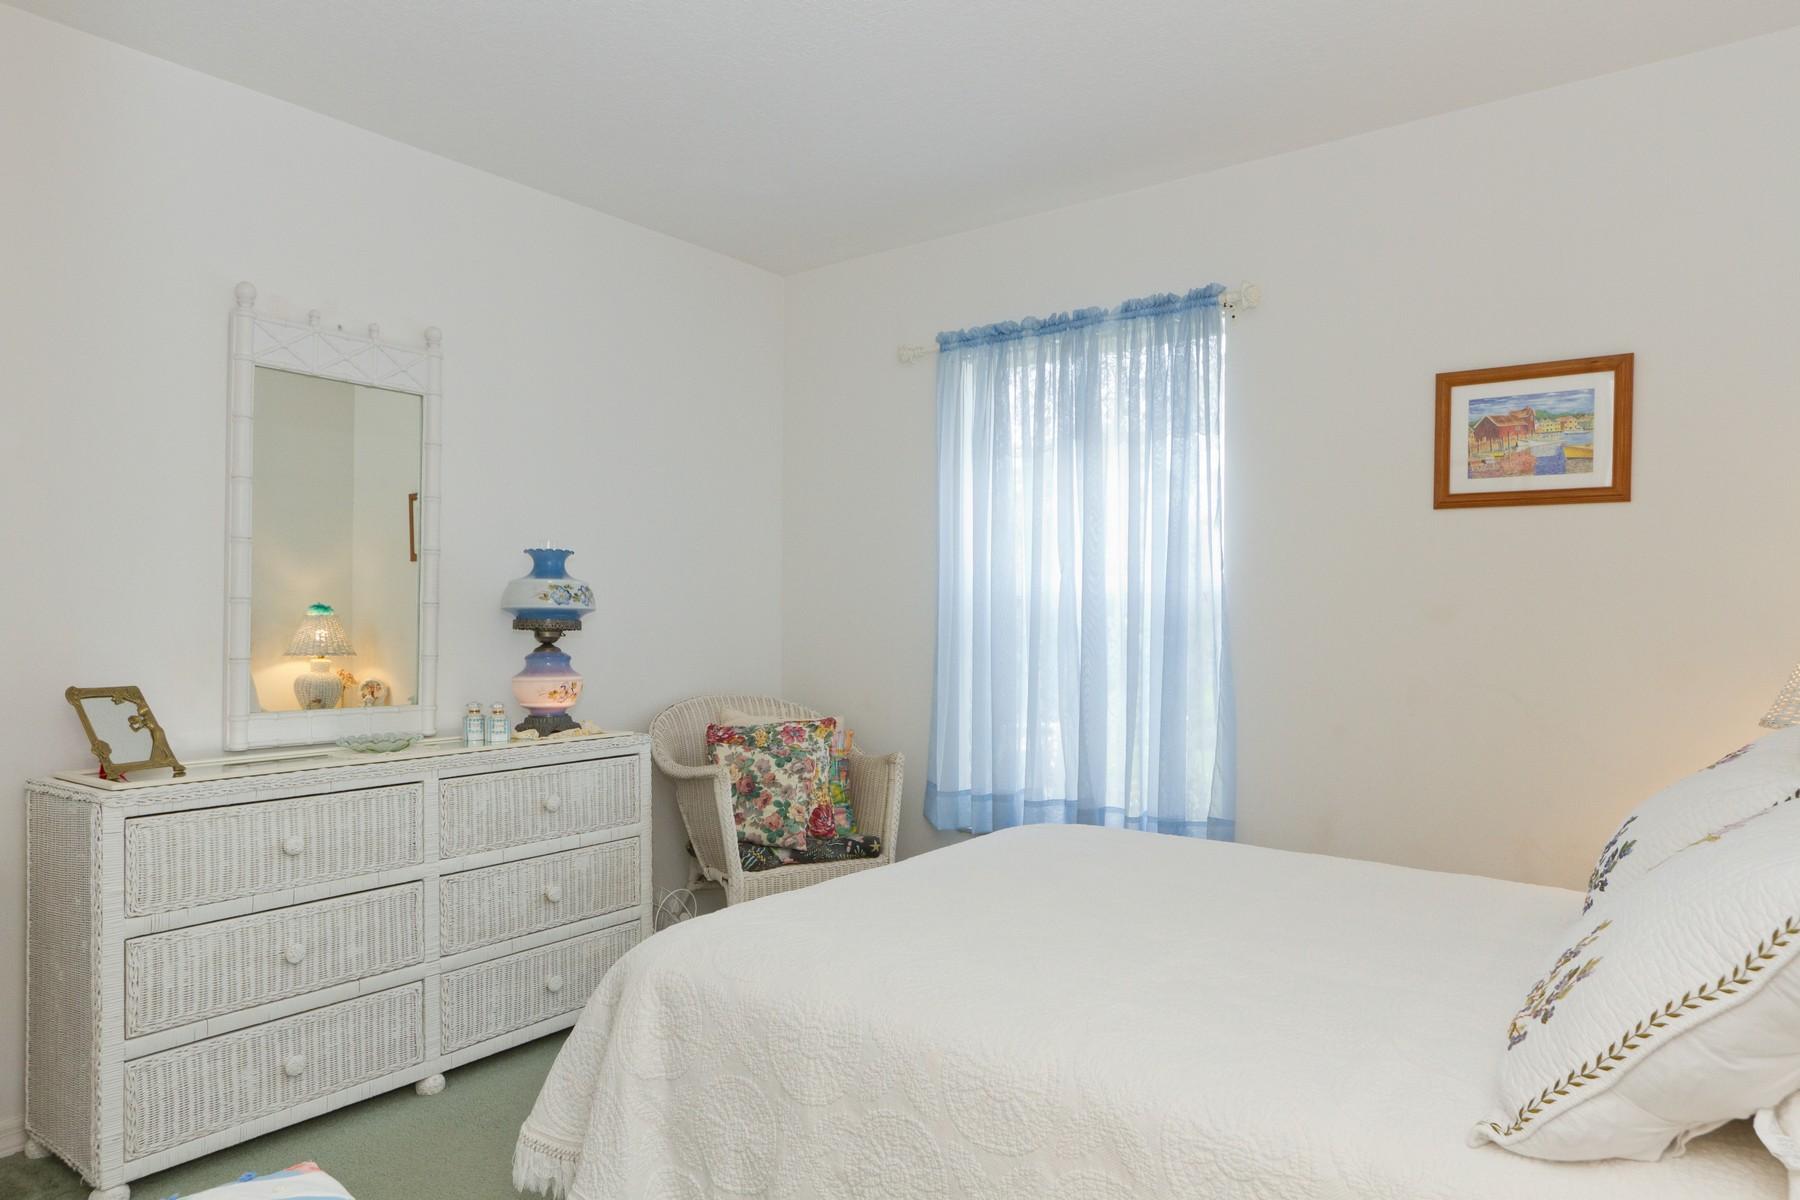 Additional photo for property listing at Welcoming Sebastian Charmer 482 Candle Avenue Sebastian, Florida 32958 United States